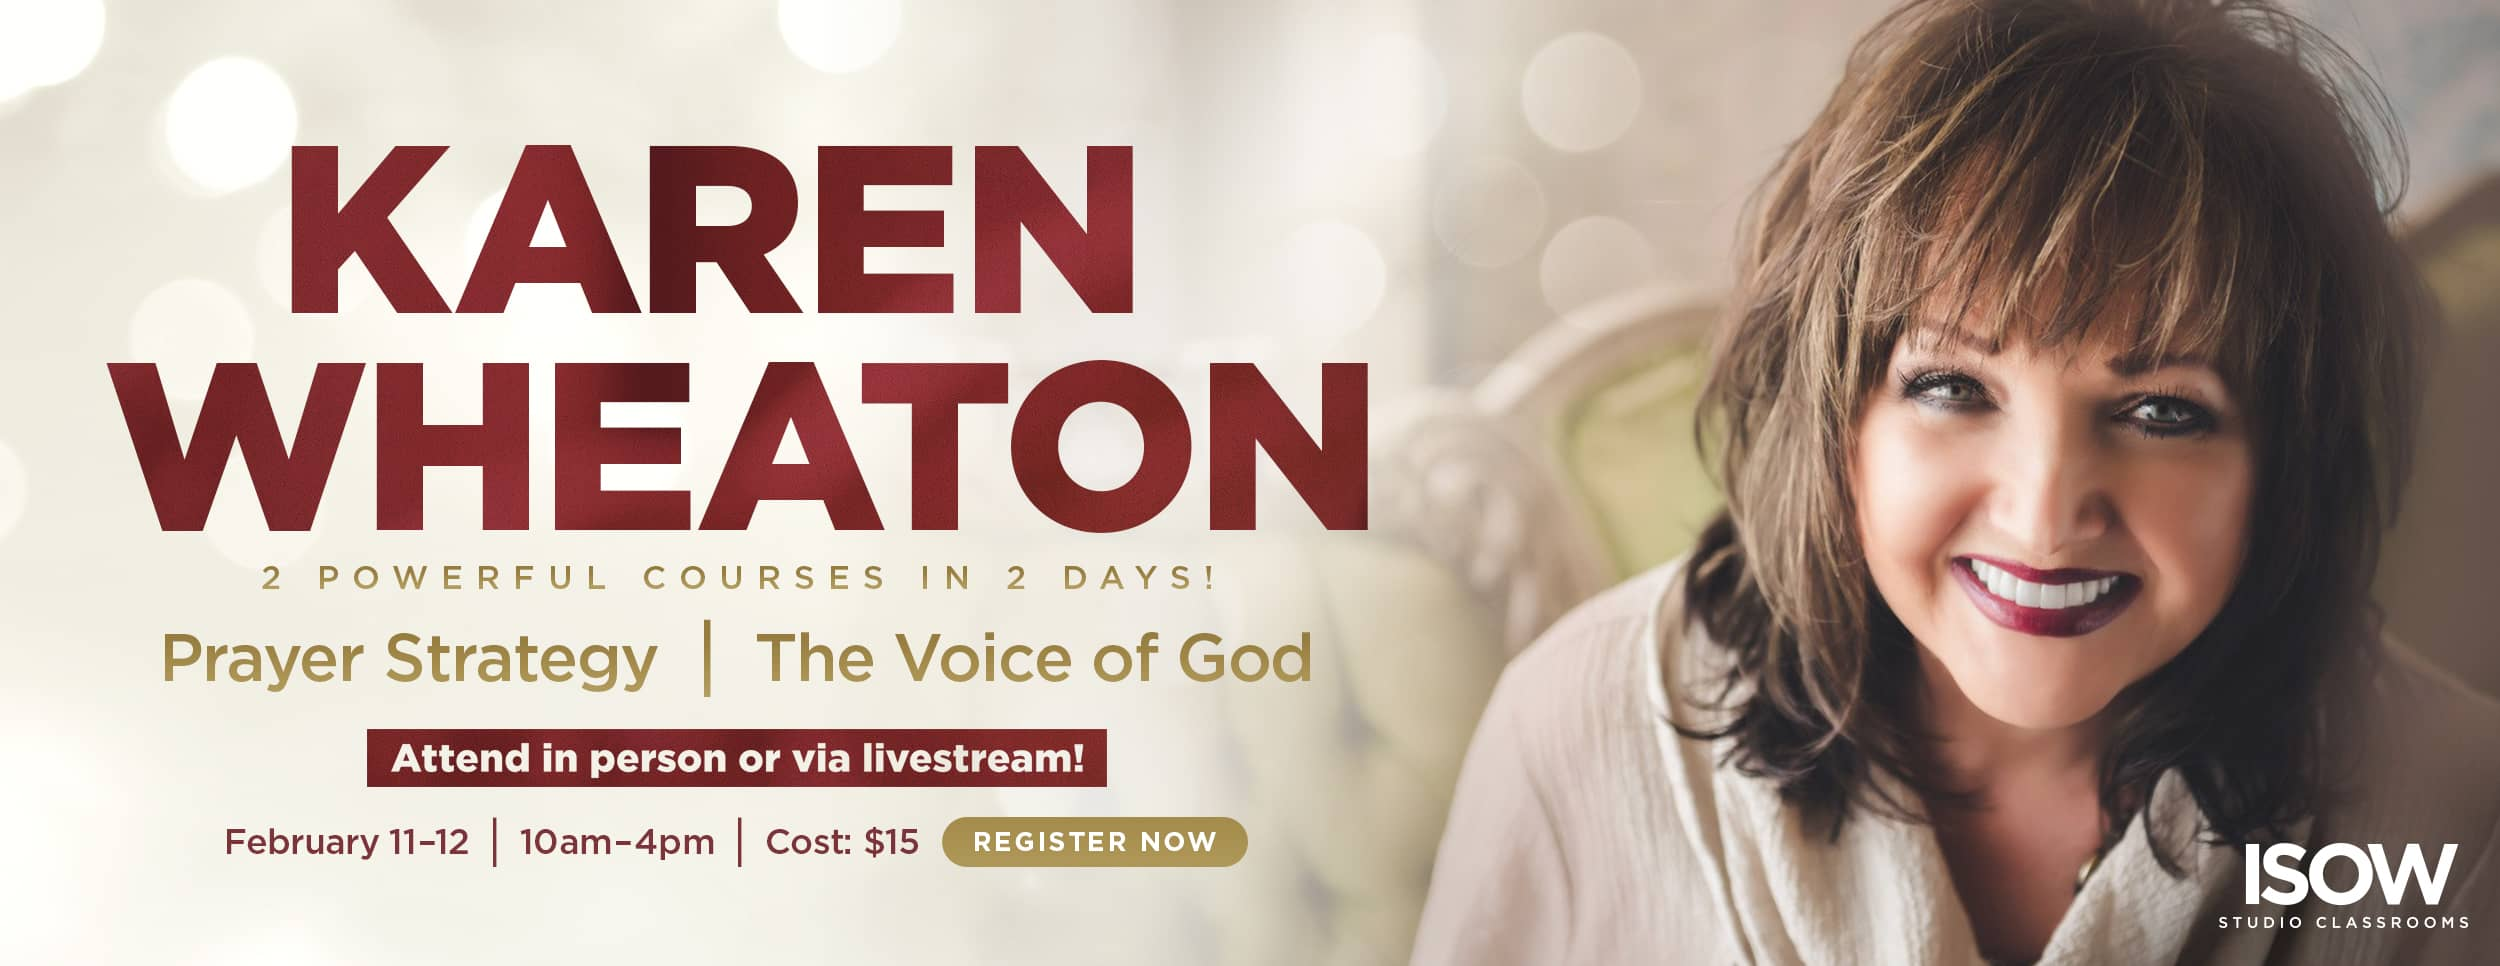 Karen Wheaton Studio Classroom $15 to Attend in person or via livestream 2/11/21 - 2/12/21, online Bible study course